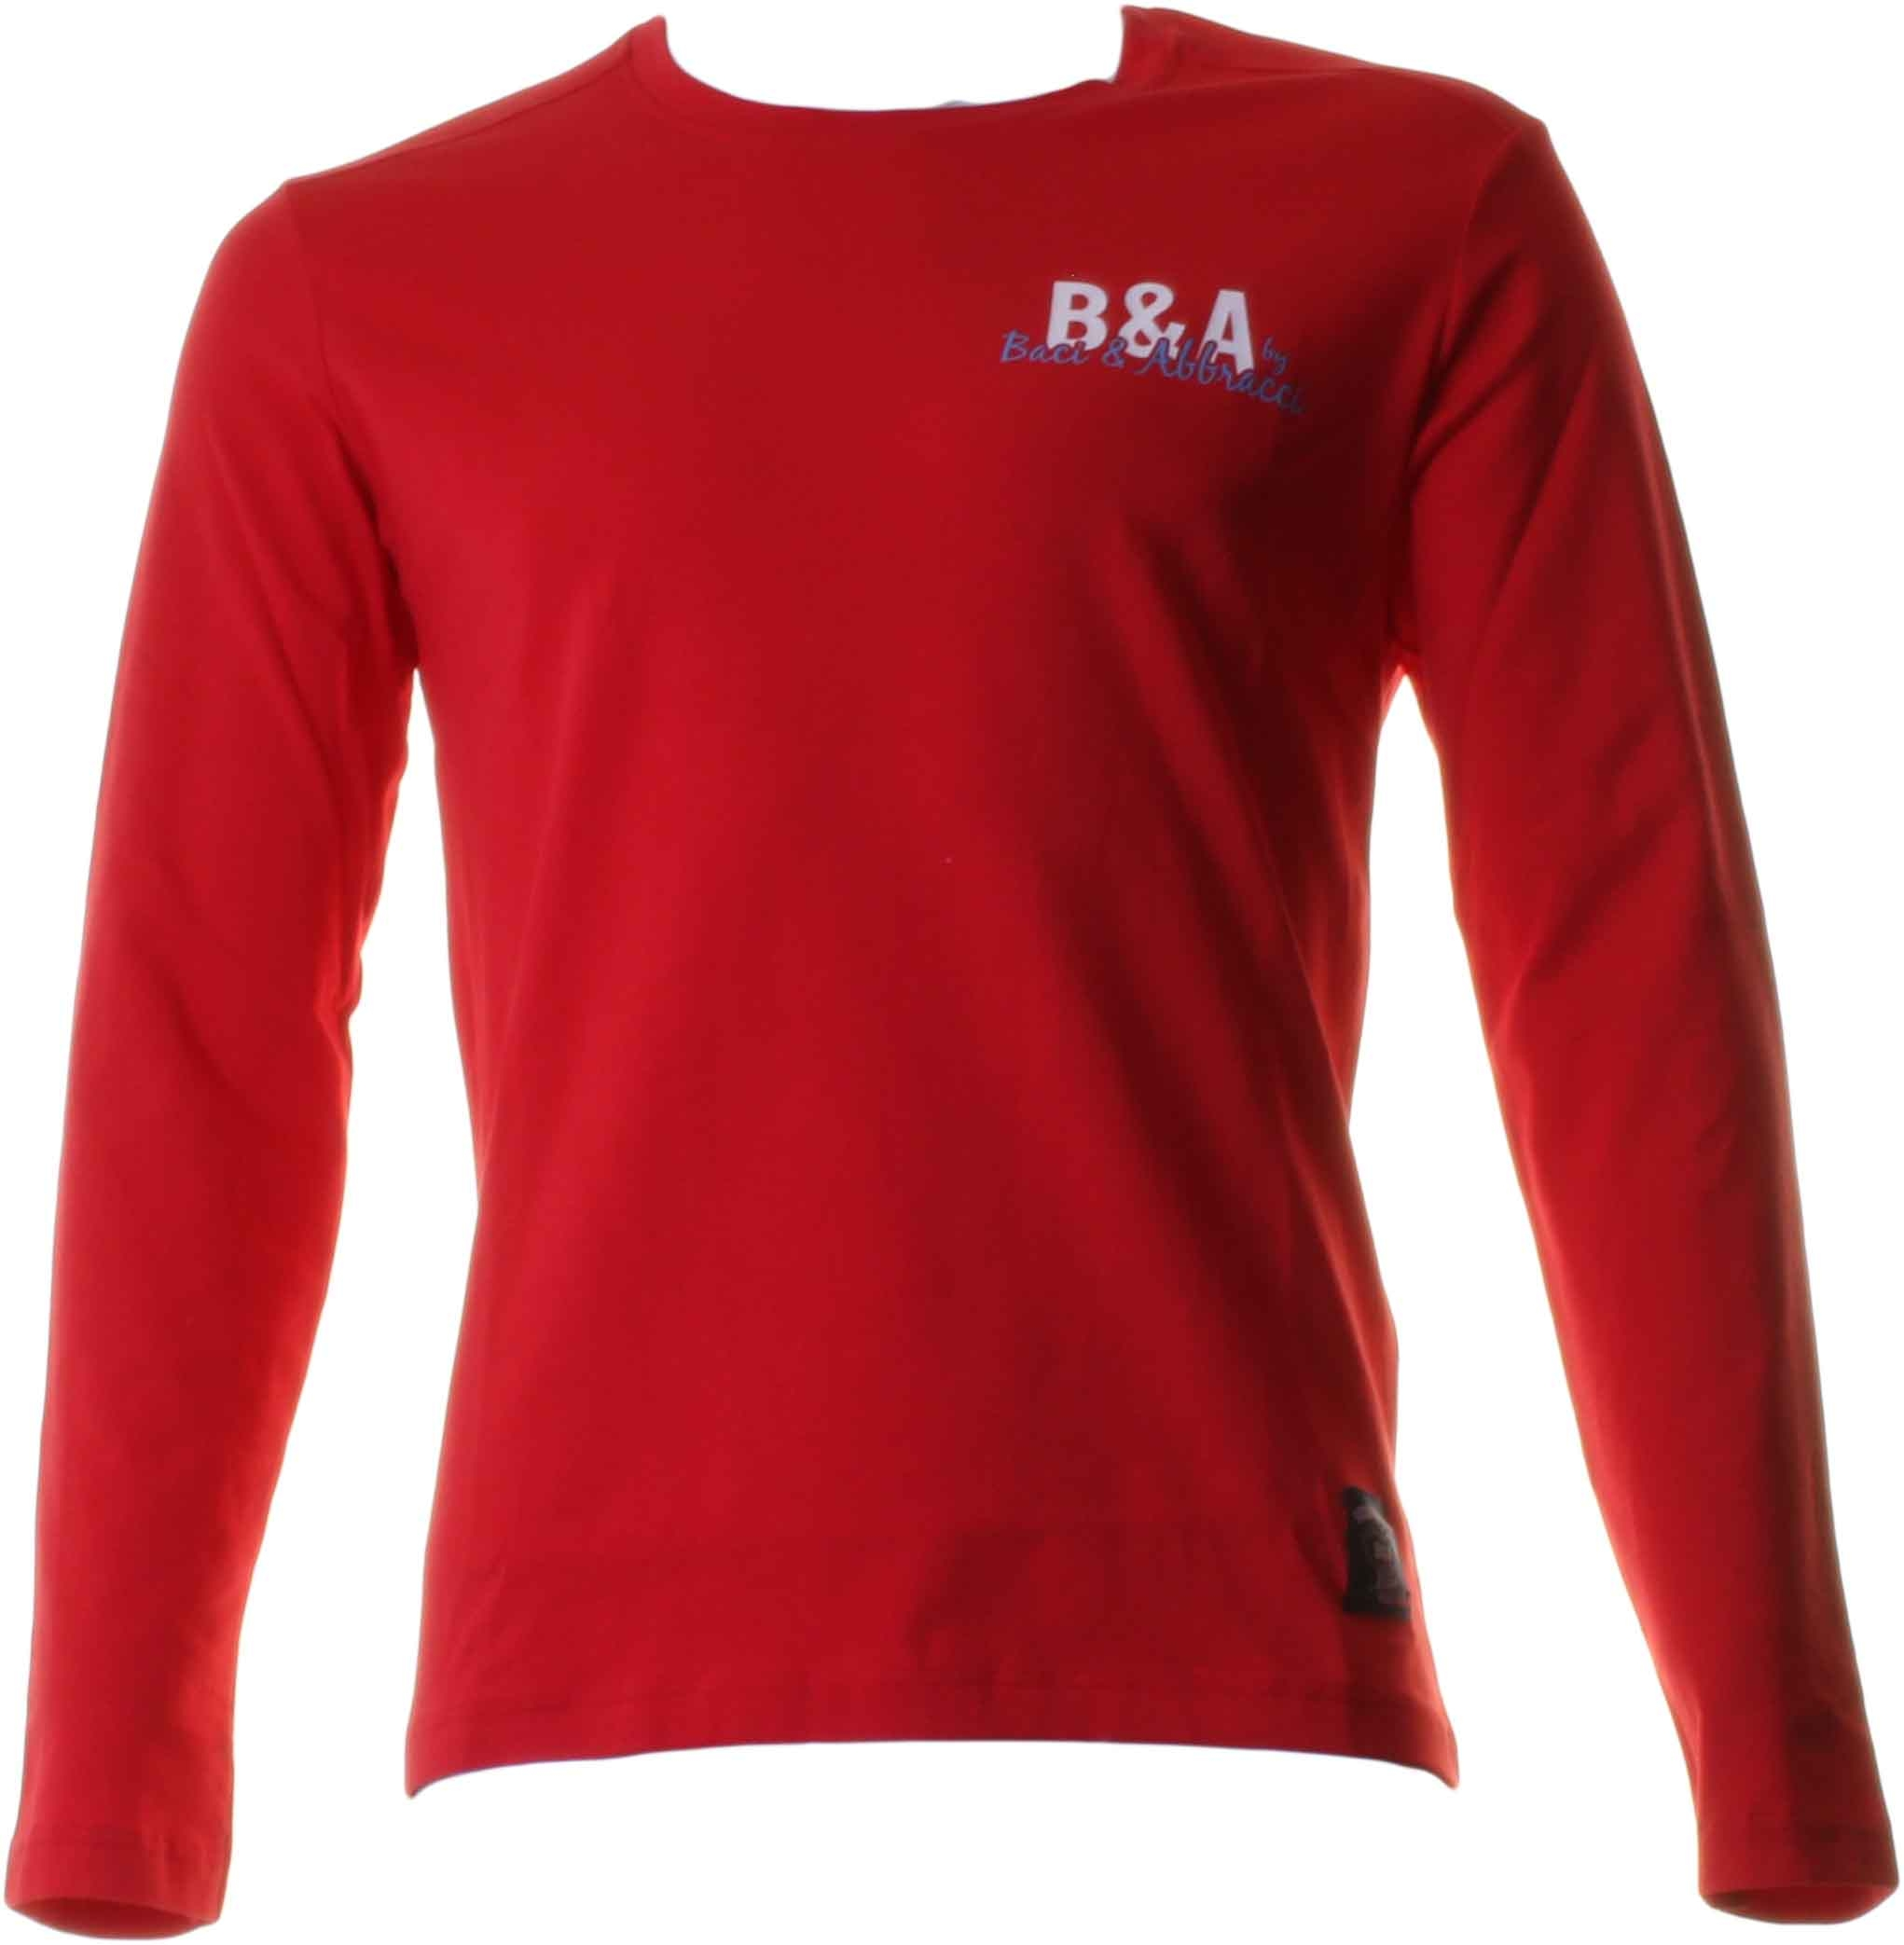 Acquista T-shirt Girocollo Maniche Lunghe 17535153   Glooke.com